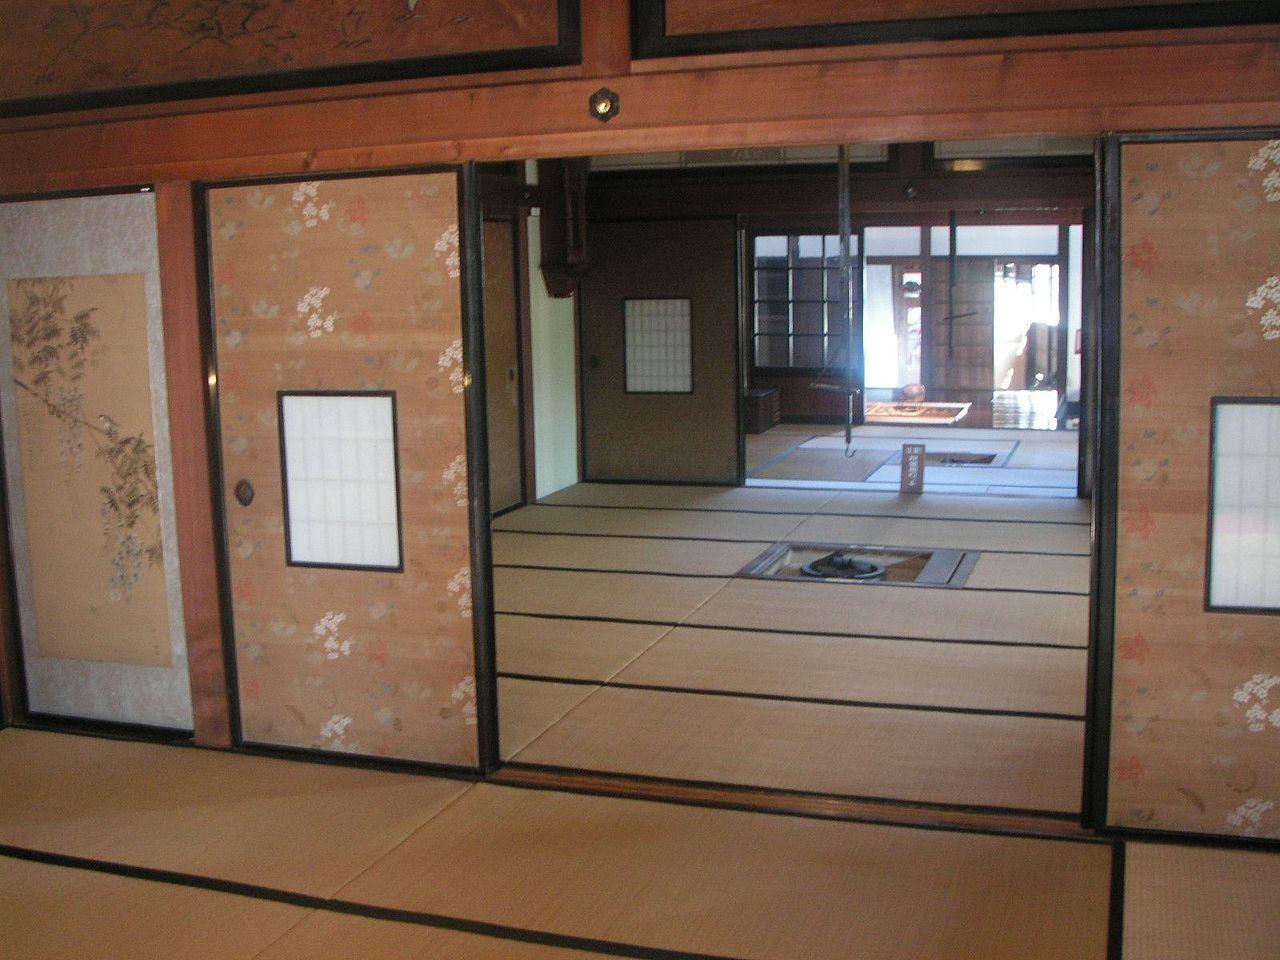 Shayokan_Osamu_Dazai_Memorial_Hall_-_Shayō_2.jpg